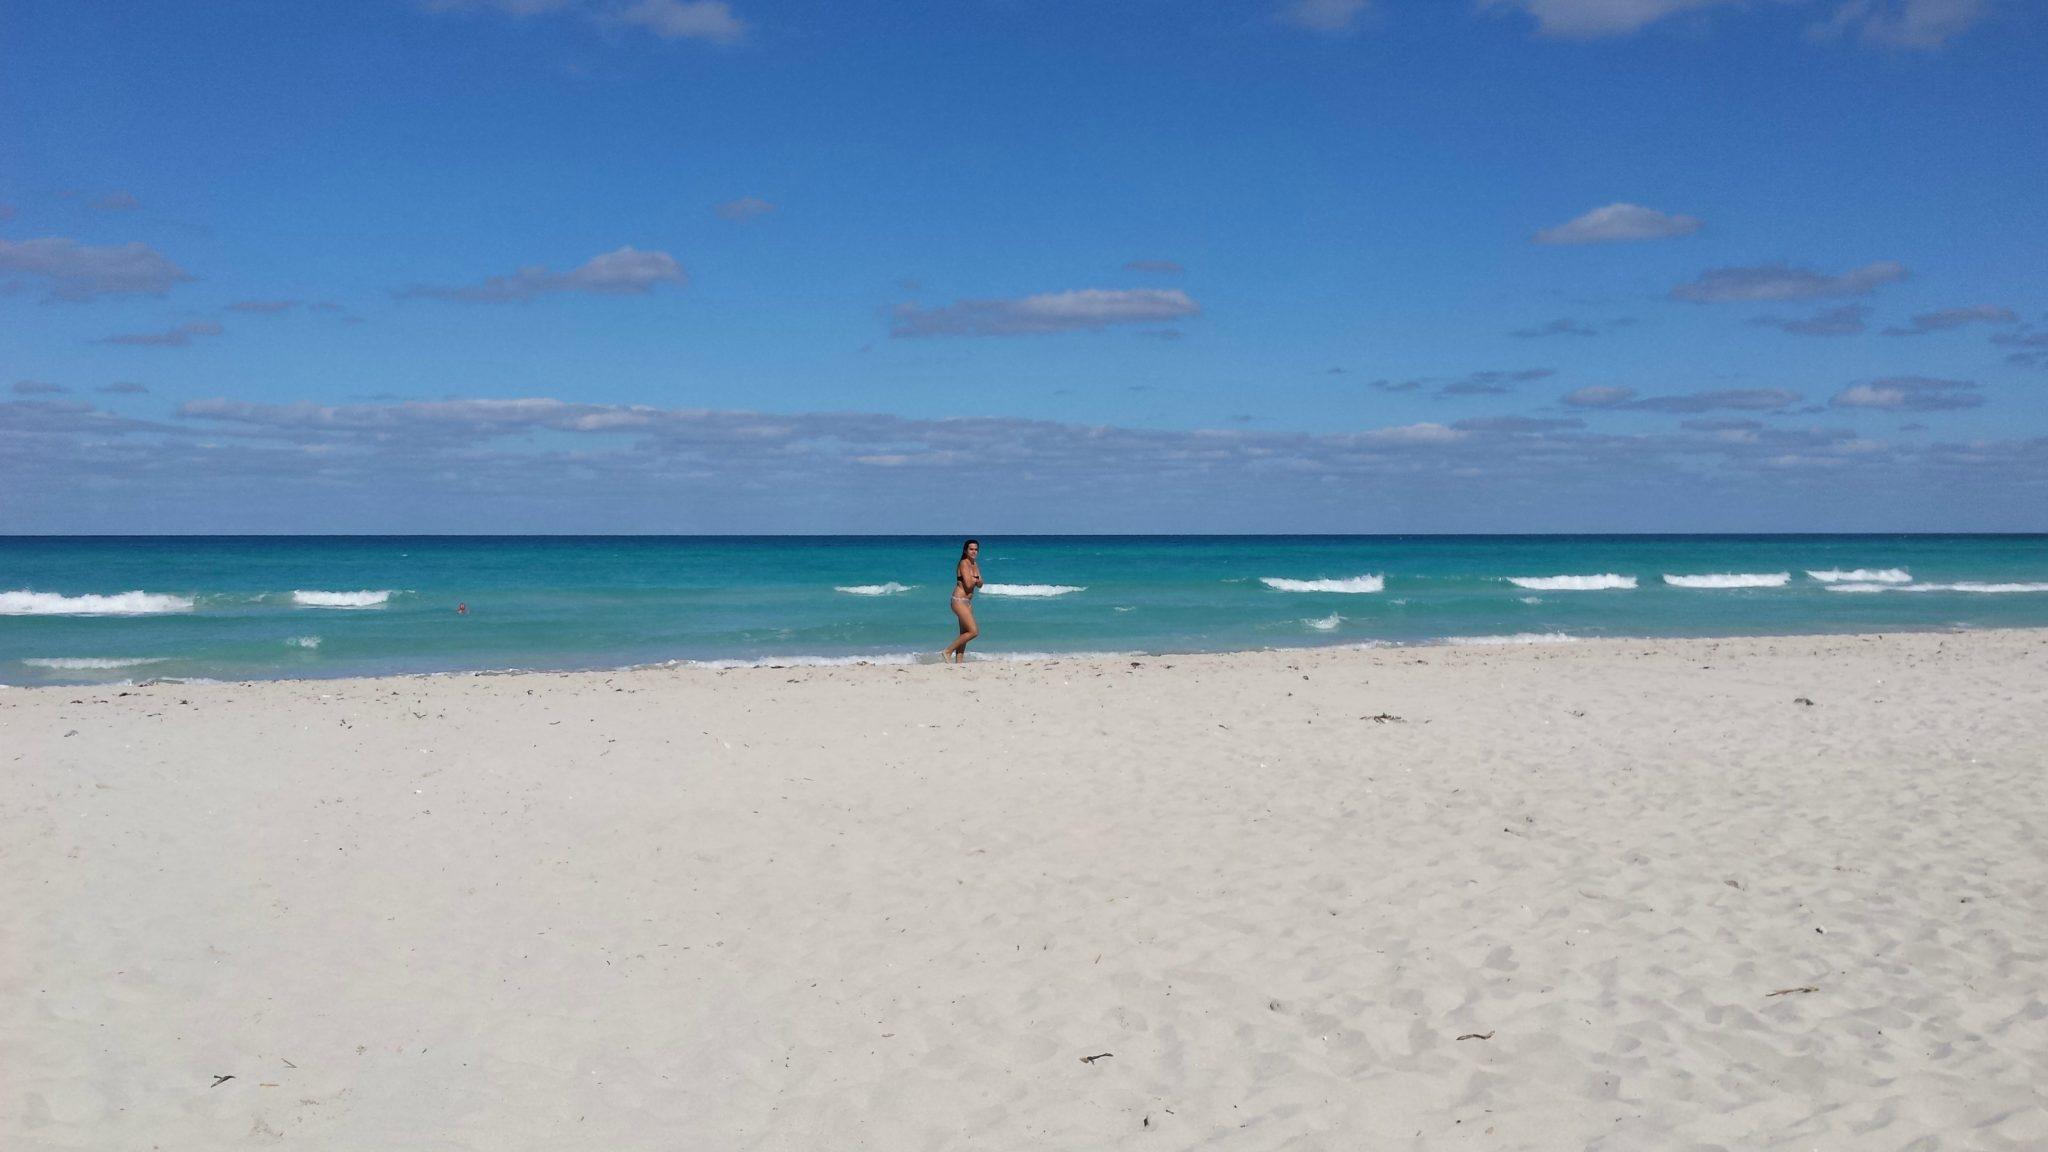 Img post Merece la pena Varadero. Playa - Pasaporte y Millas